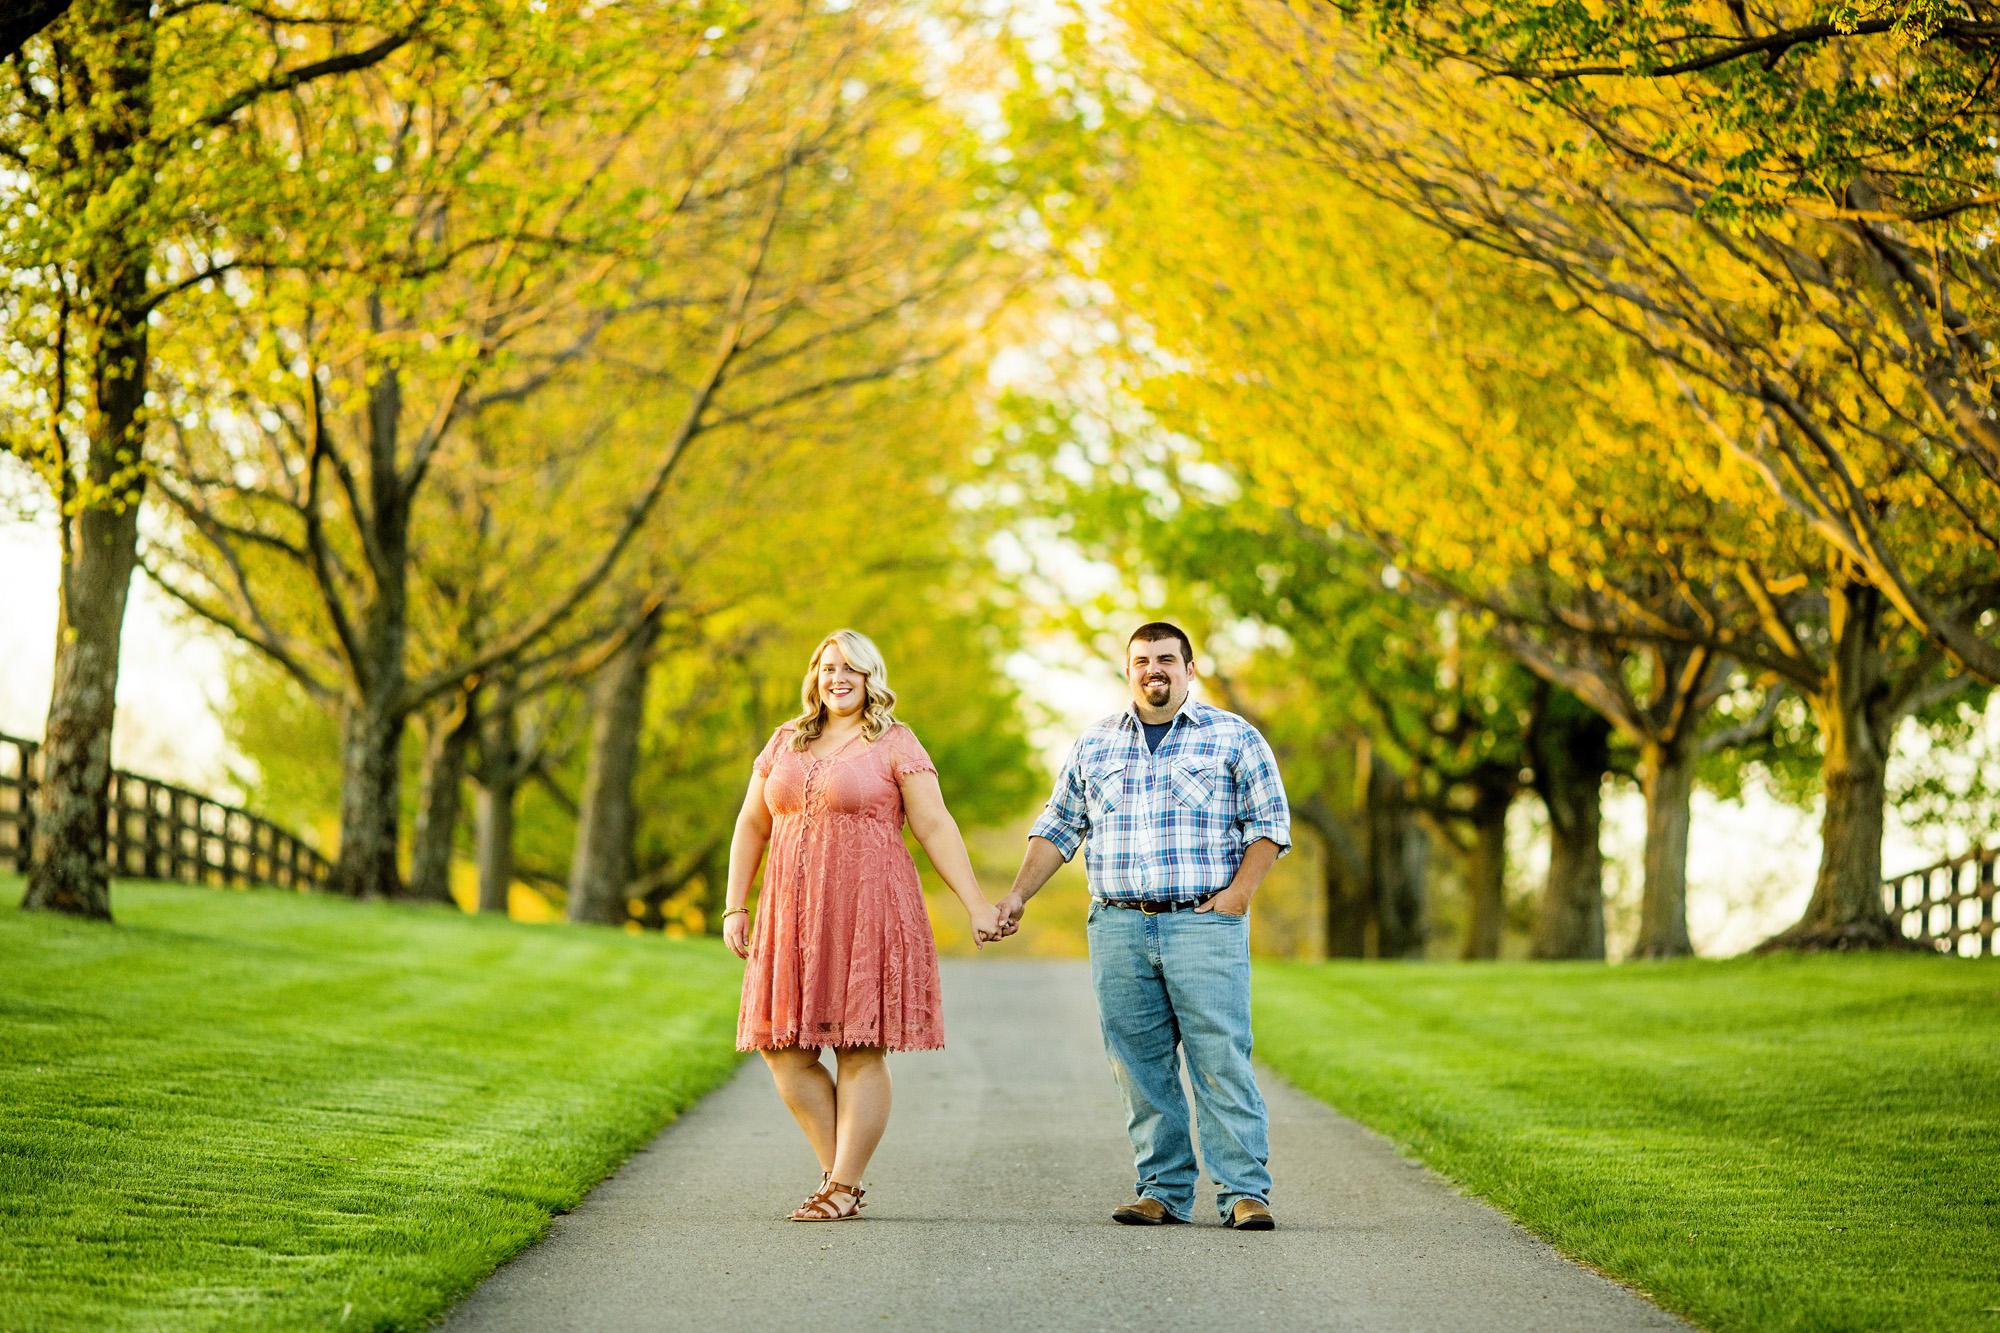 Seriously_Sabrina_Photography_Lexington_Kentucky_Sunset_Farm_Engagement_Cody_Sara_27.jpg